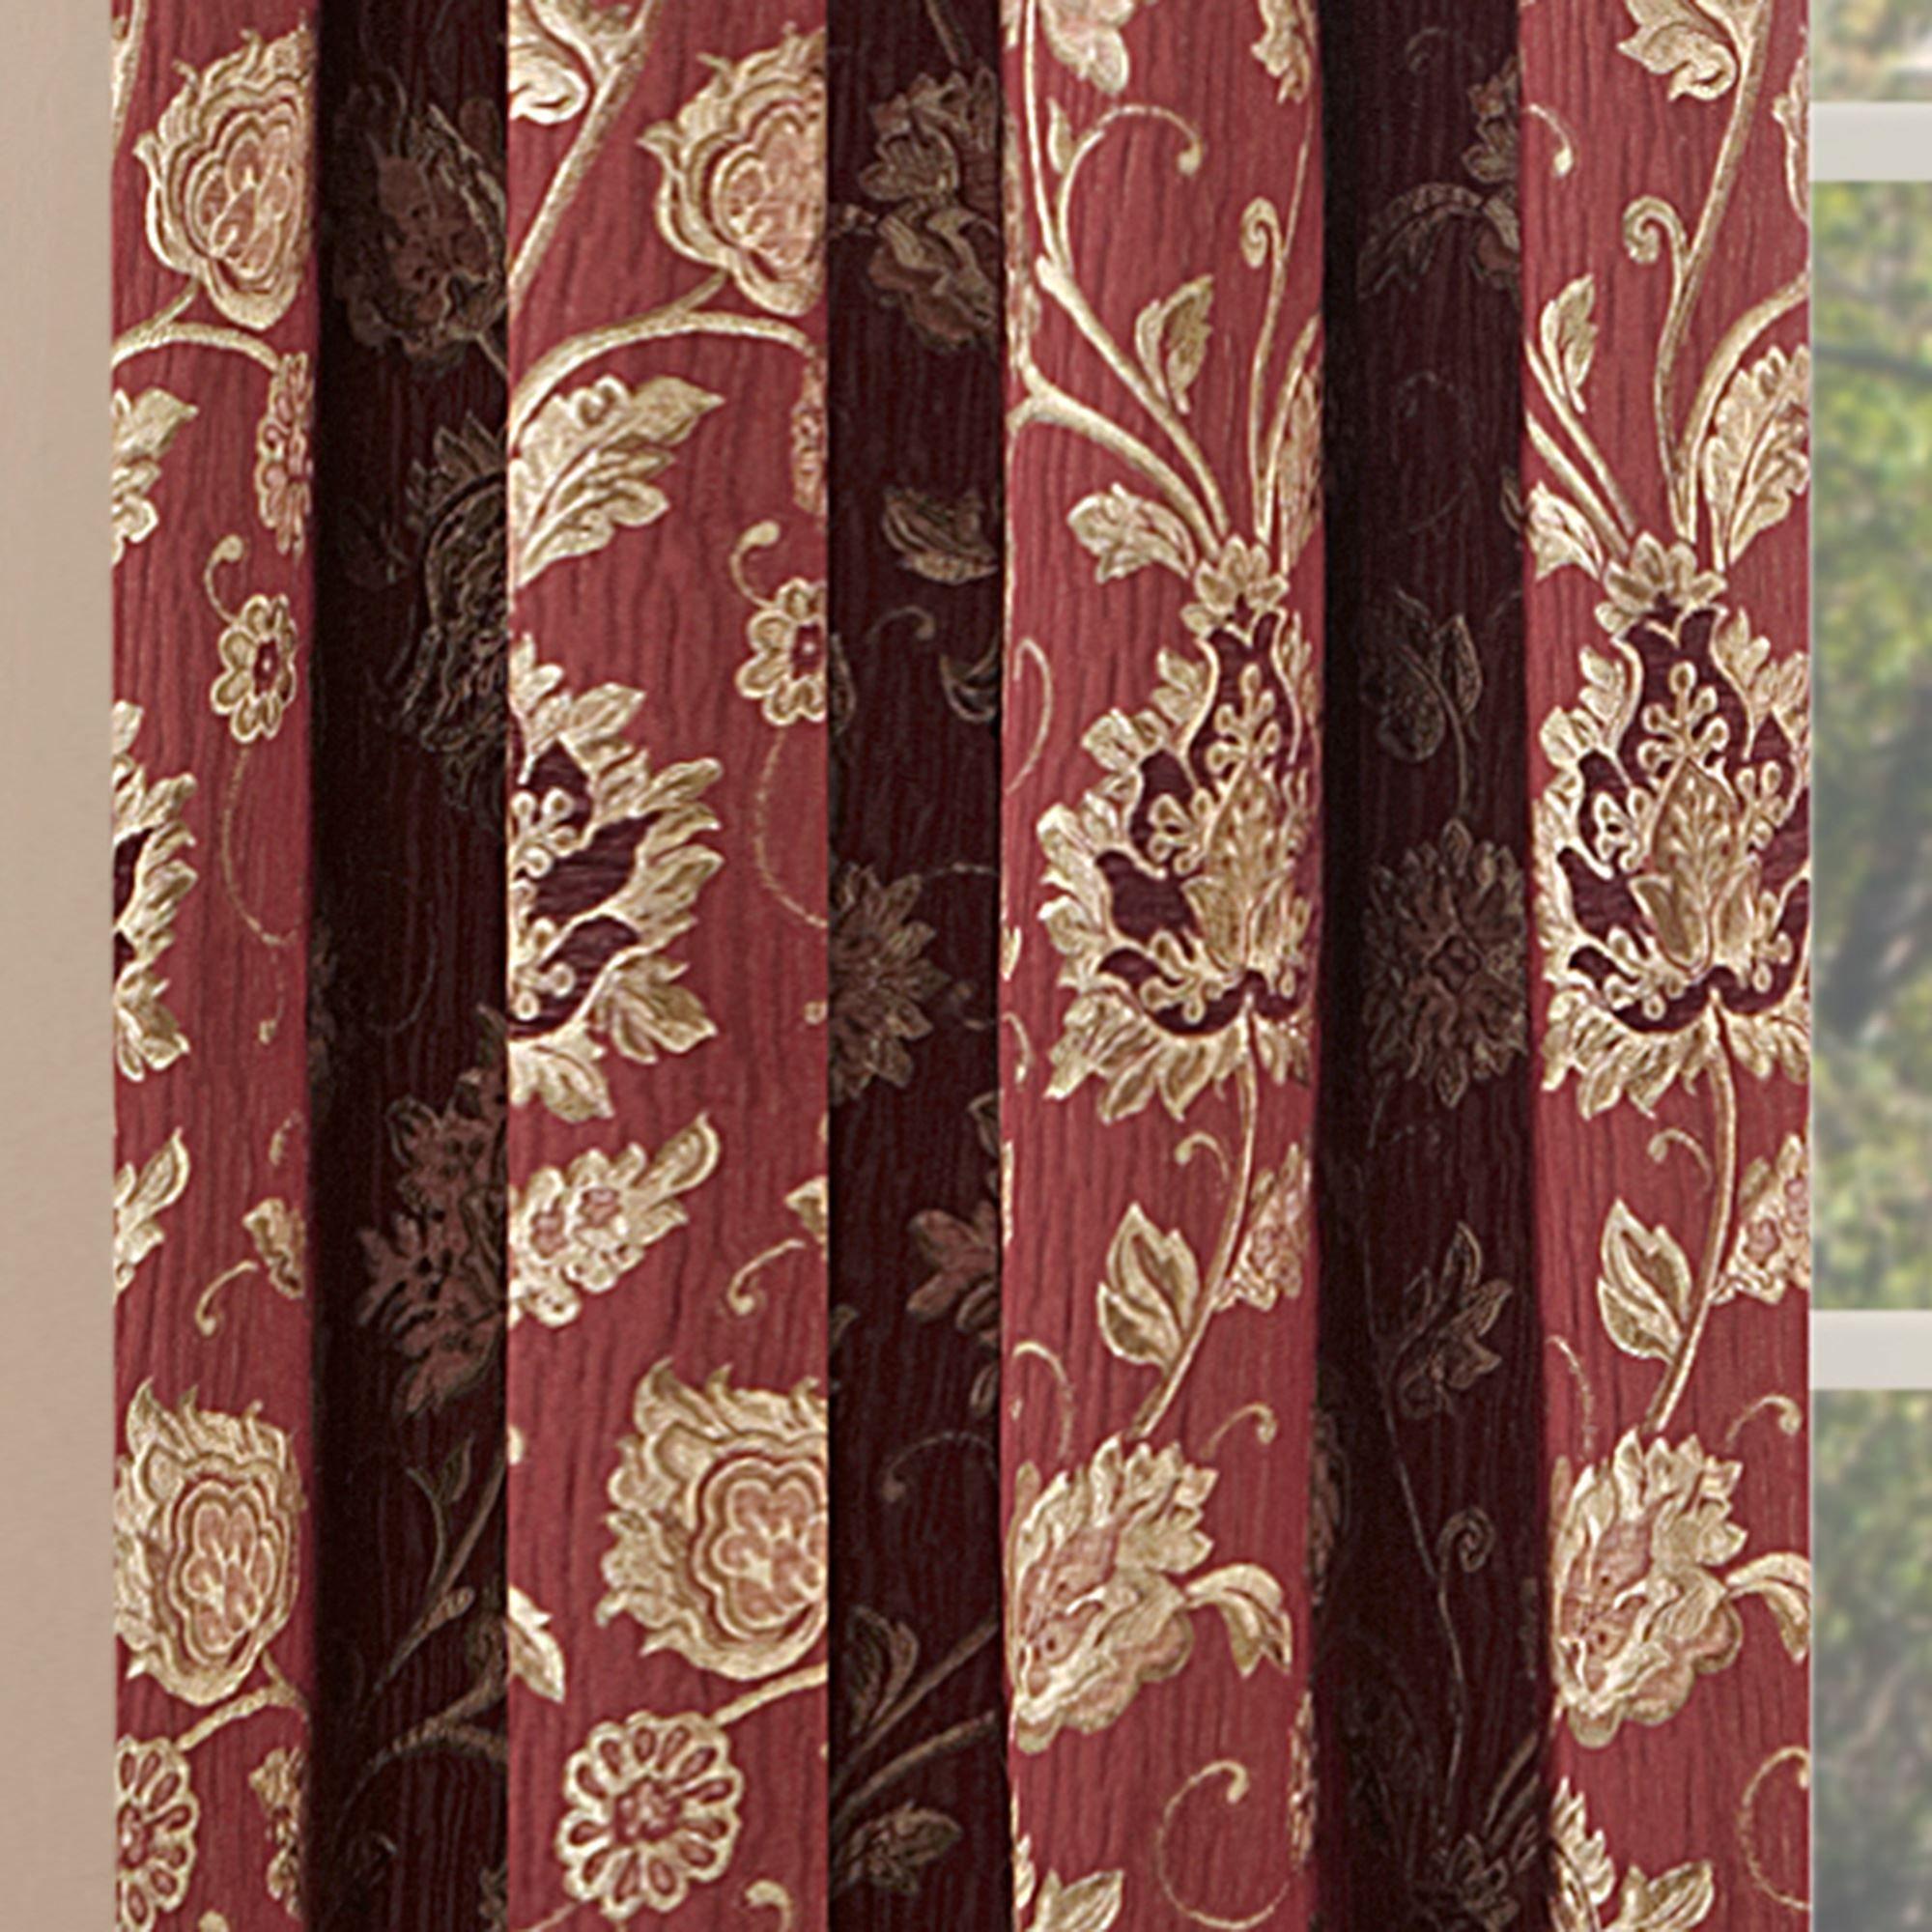 Melbourne Burgundy Tailored Panel